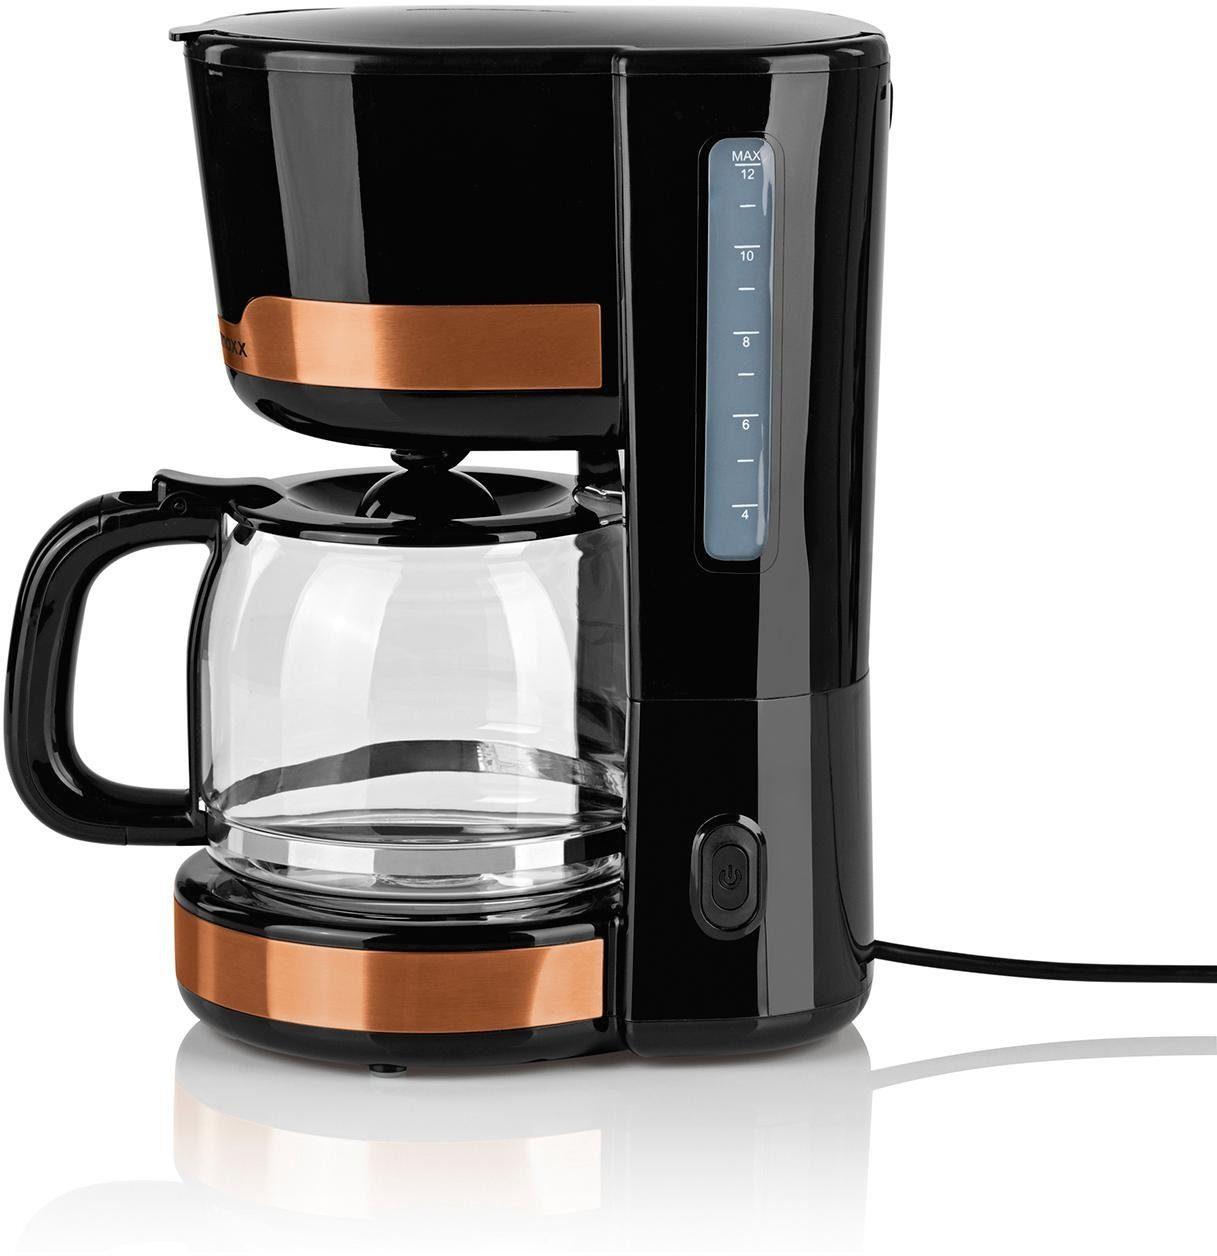 GOURMETmaxx Siebträger-/Filterkaffeemaschine 1000 Watt, kupferfarben